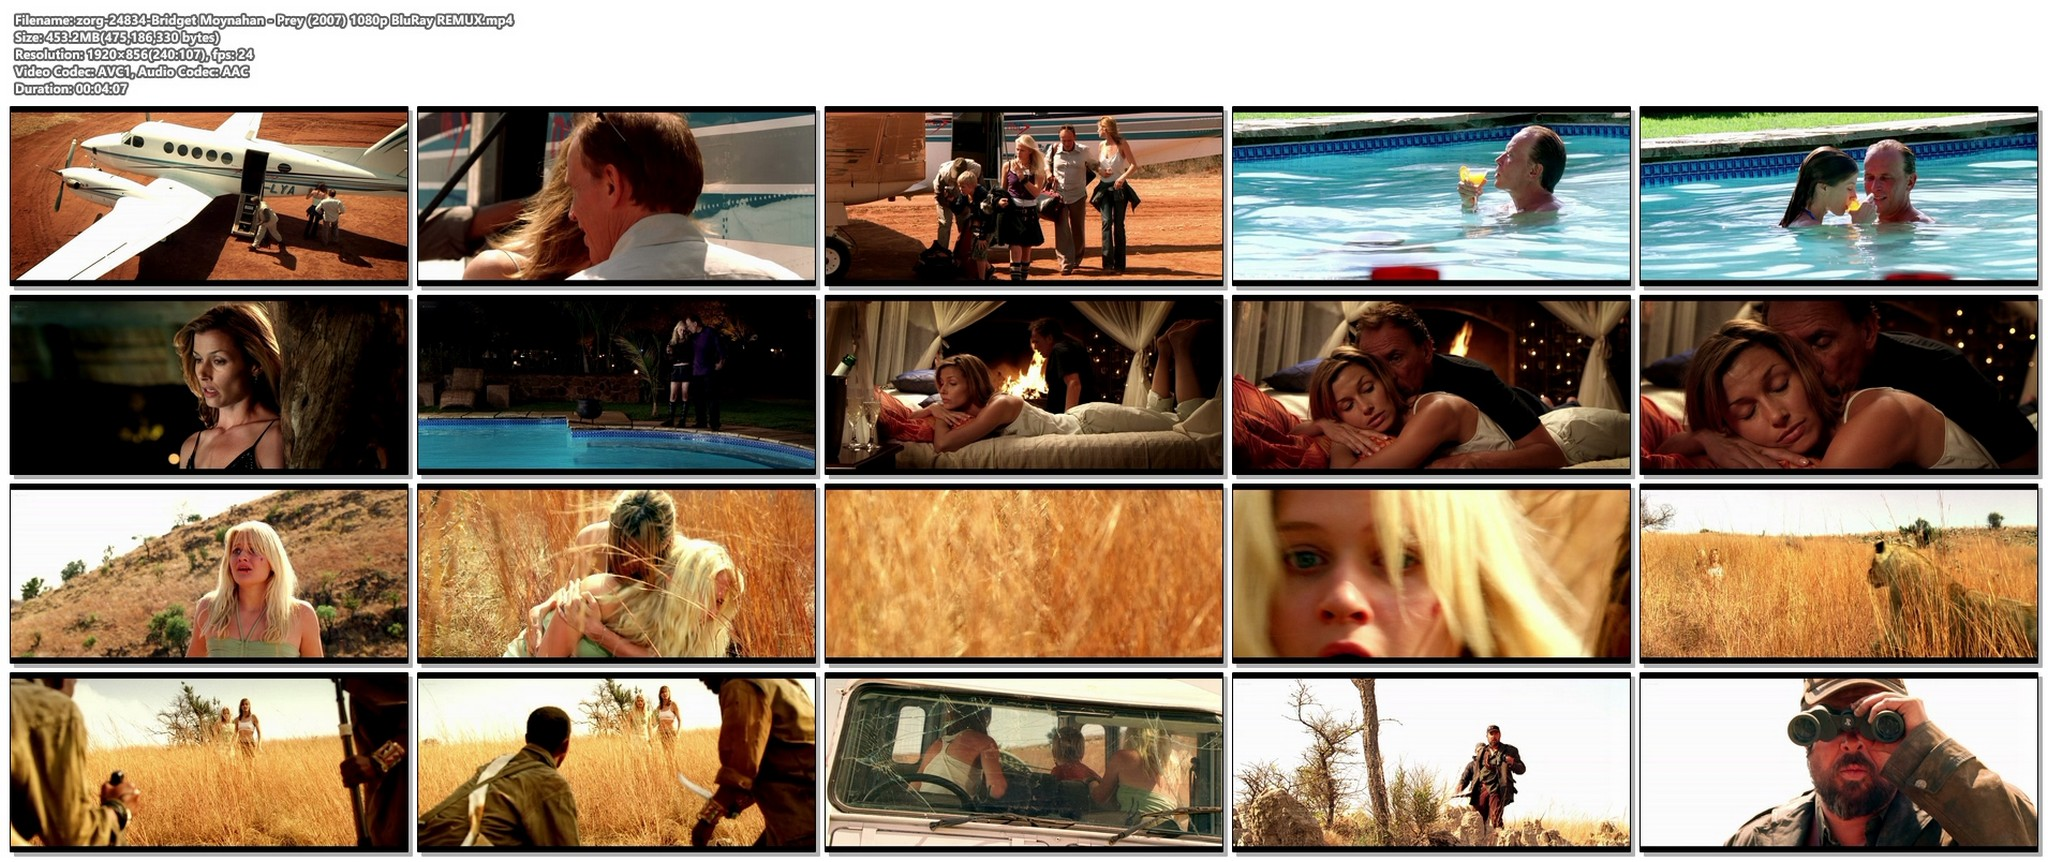 Bridget Moynahan hot and sexy Prey 2007 1080p BluRay REMUX 13